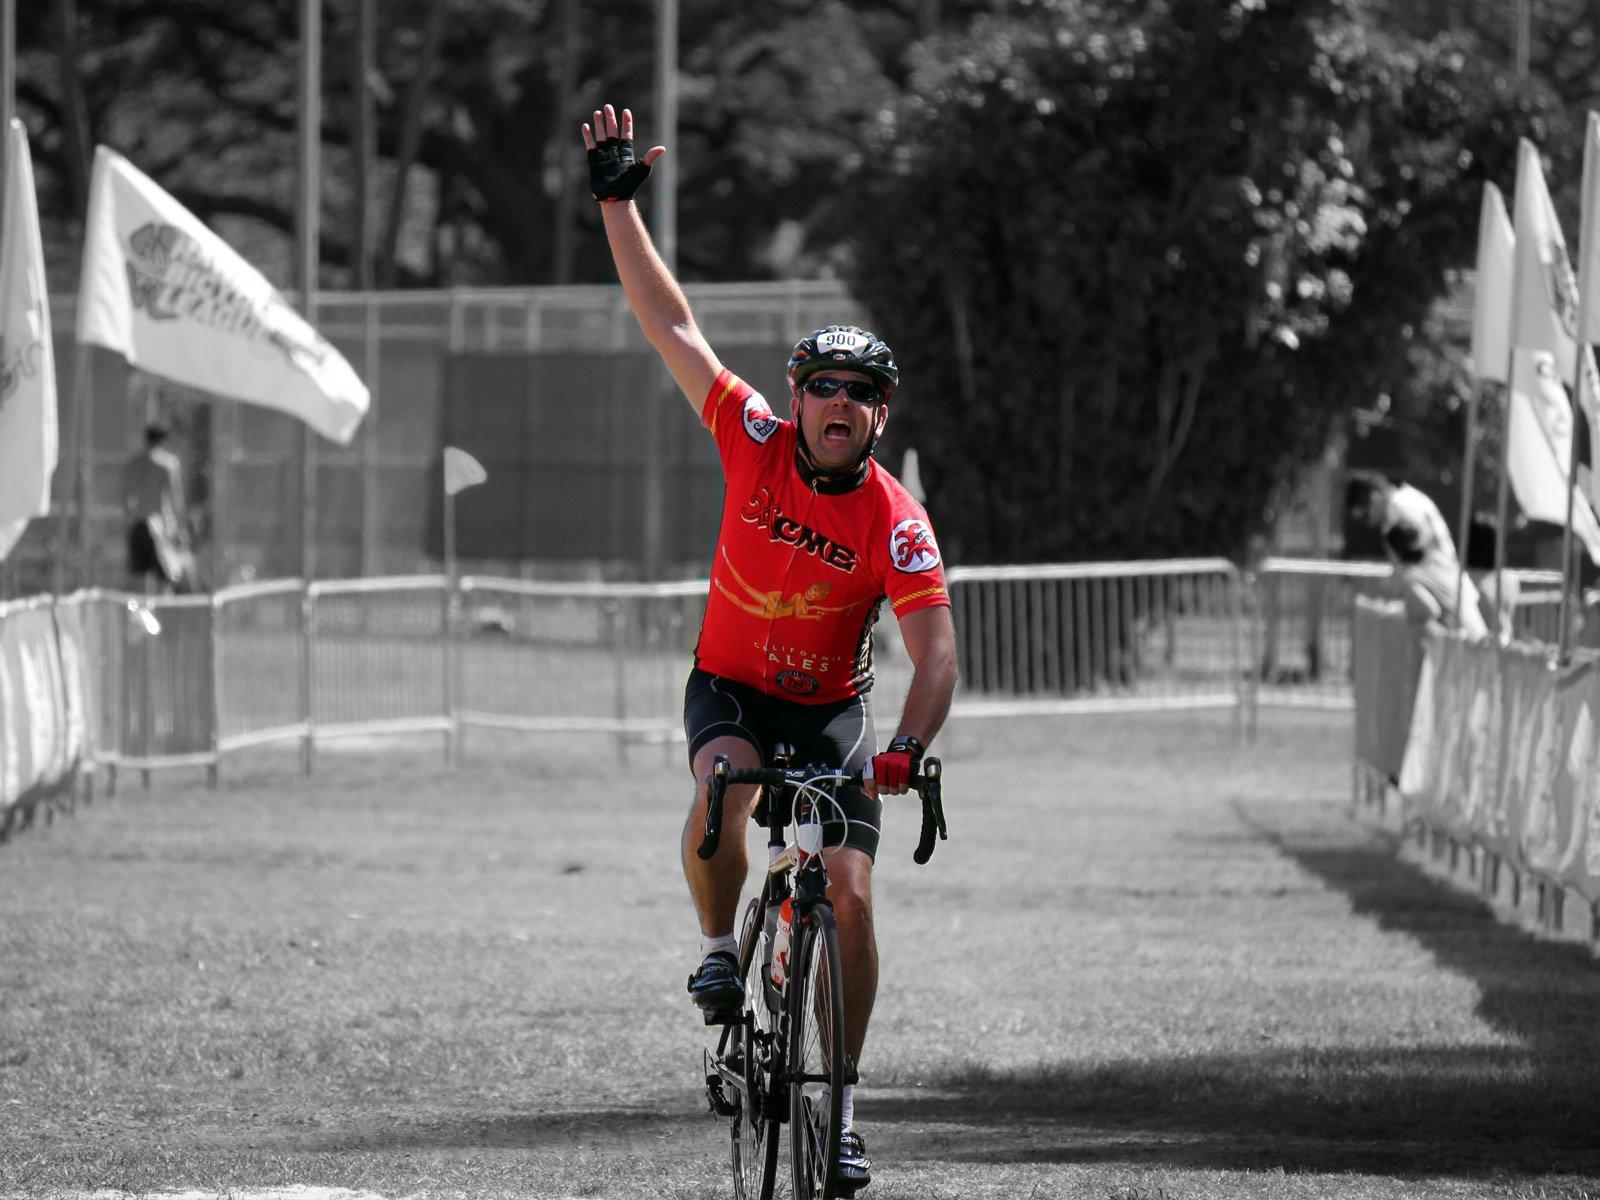 Century Ride 2013 pic 2 56 1250 BW